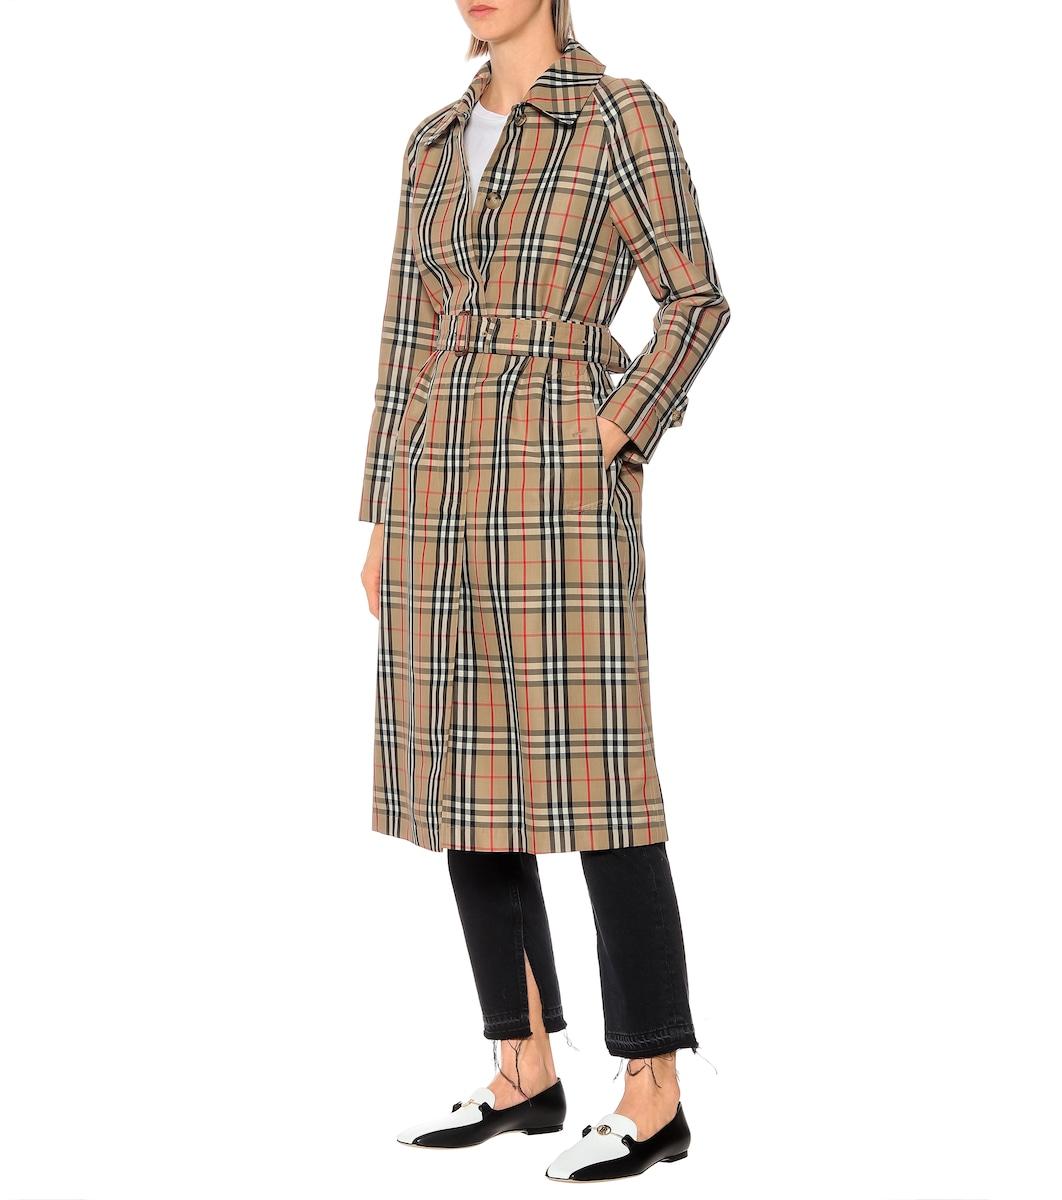 866912ab2 Vintage Check Trench Coat - Burberry | mytheresa